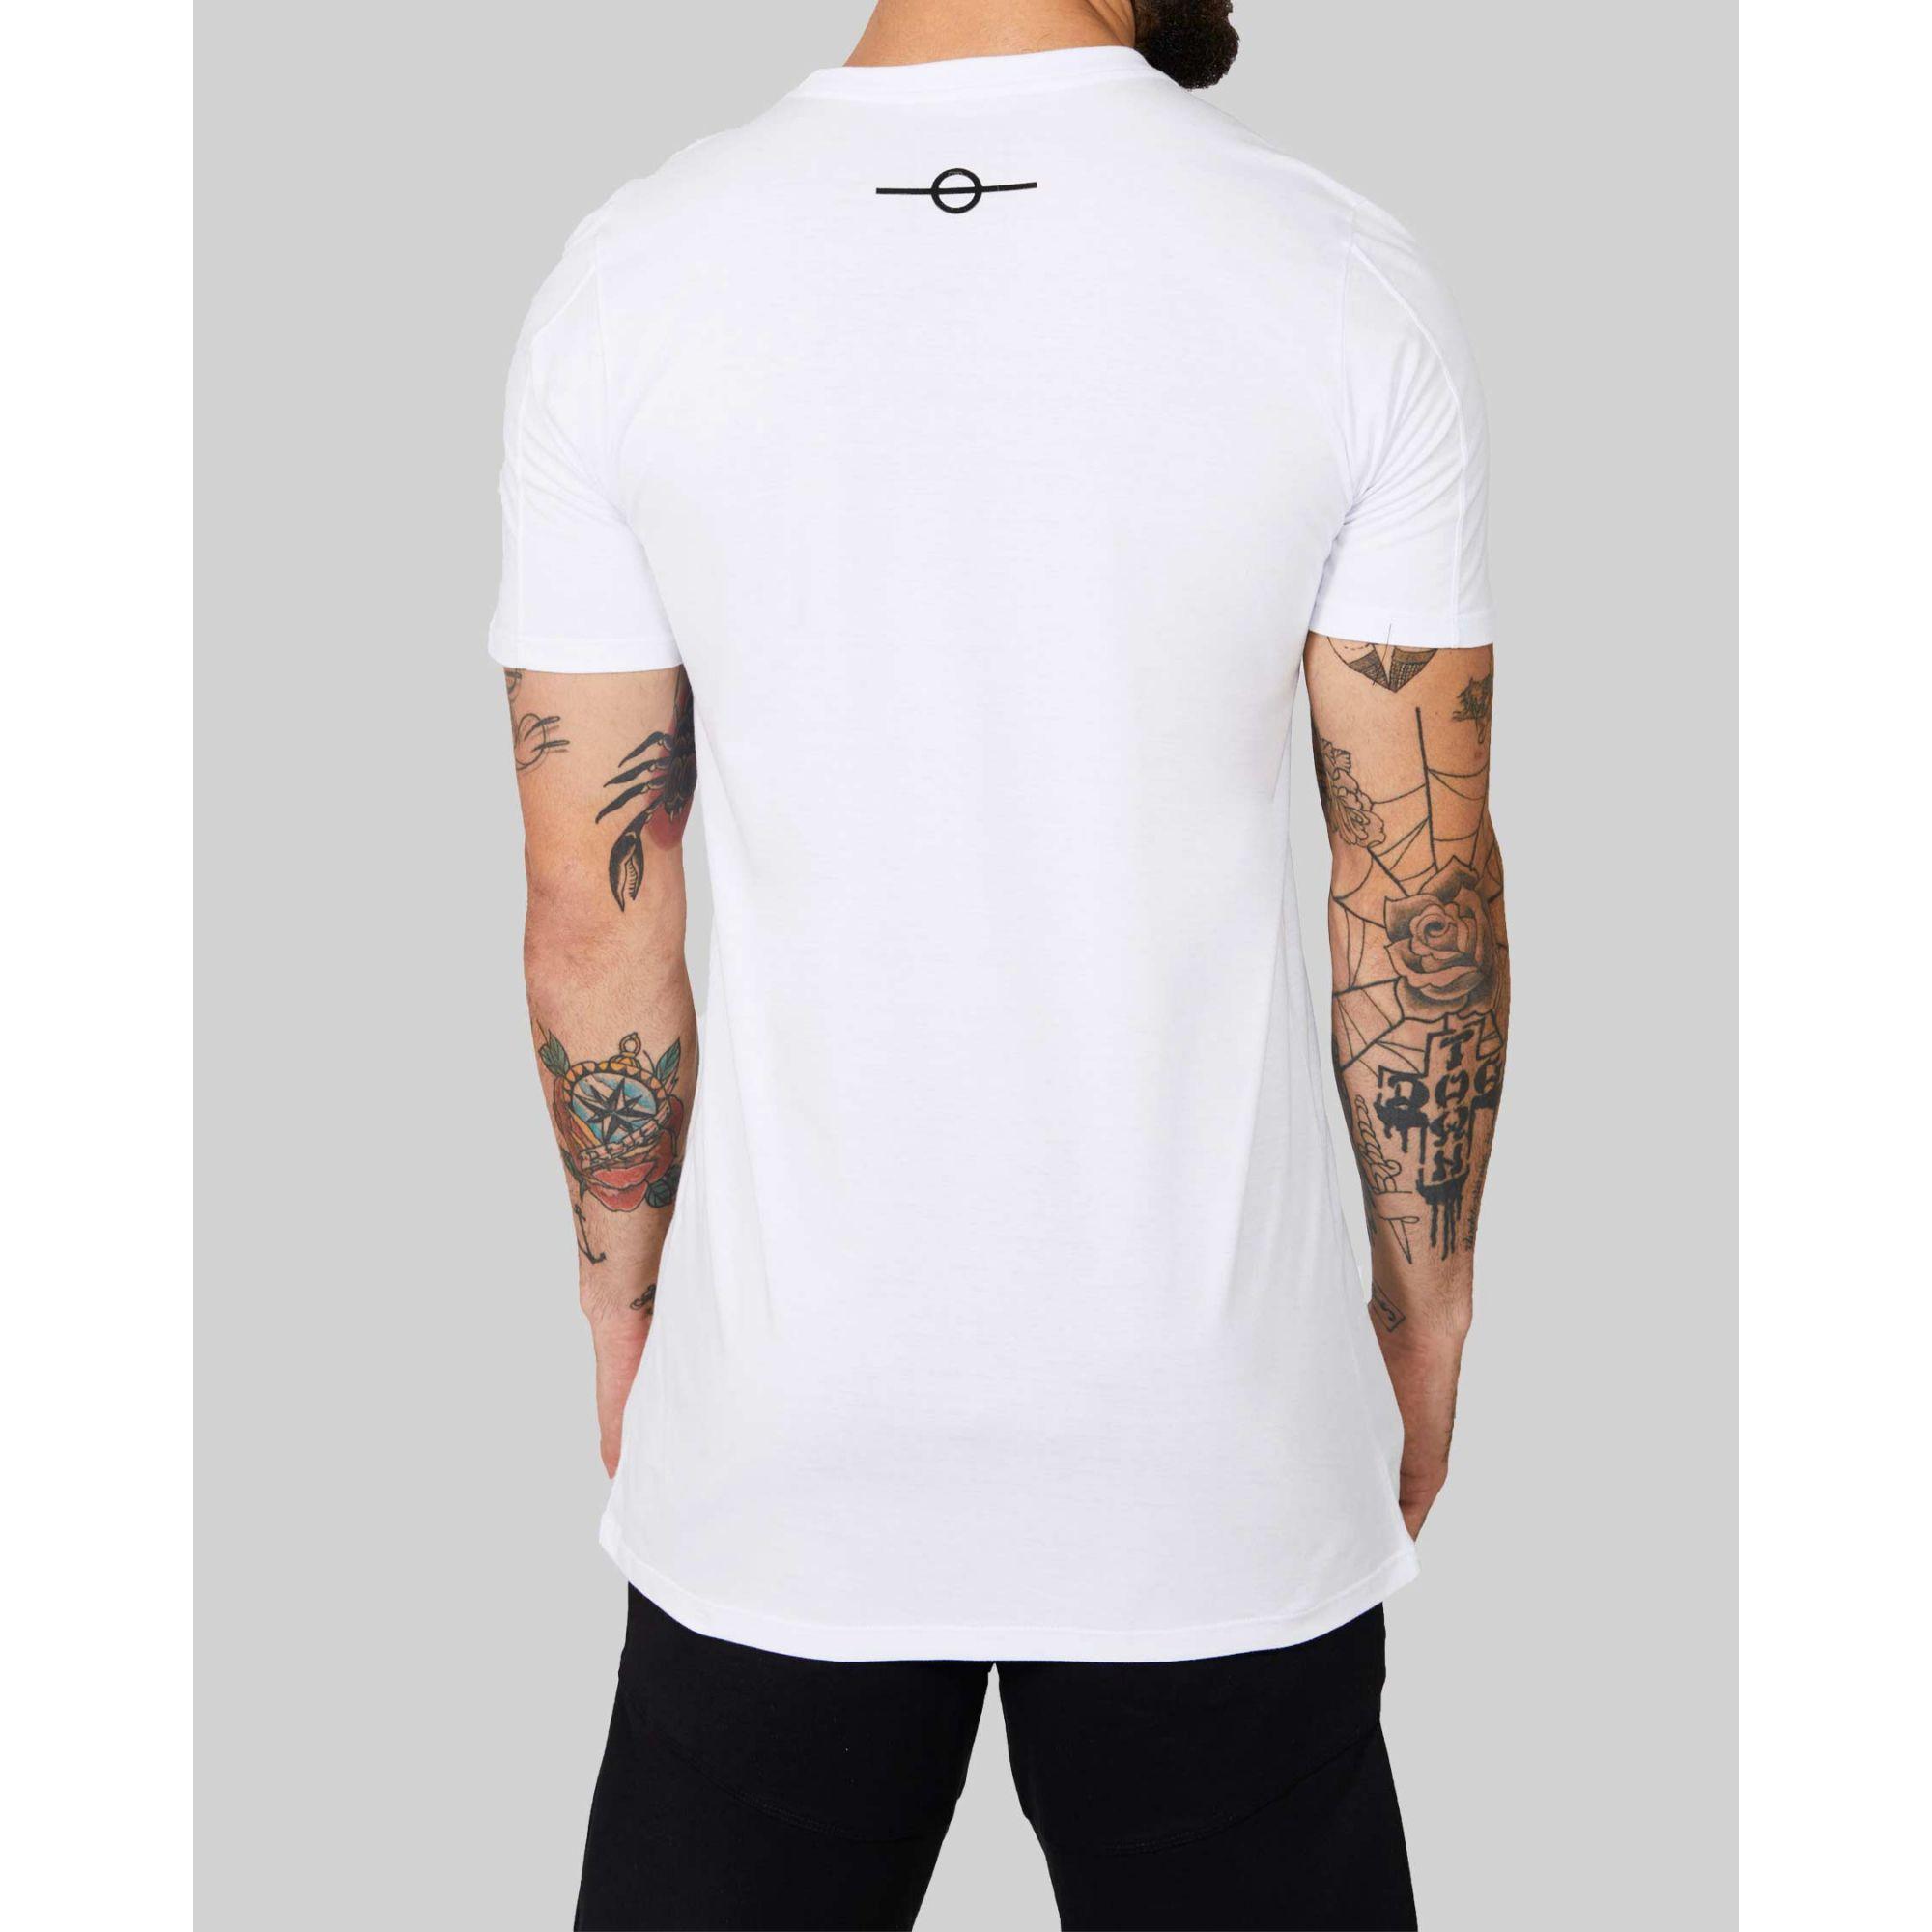 Camiseta Buh Placa Gomo White